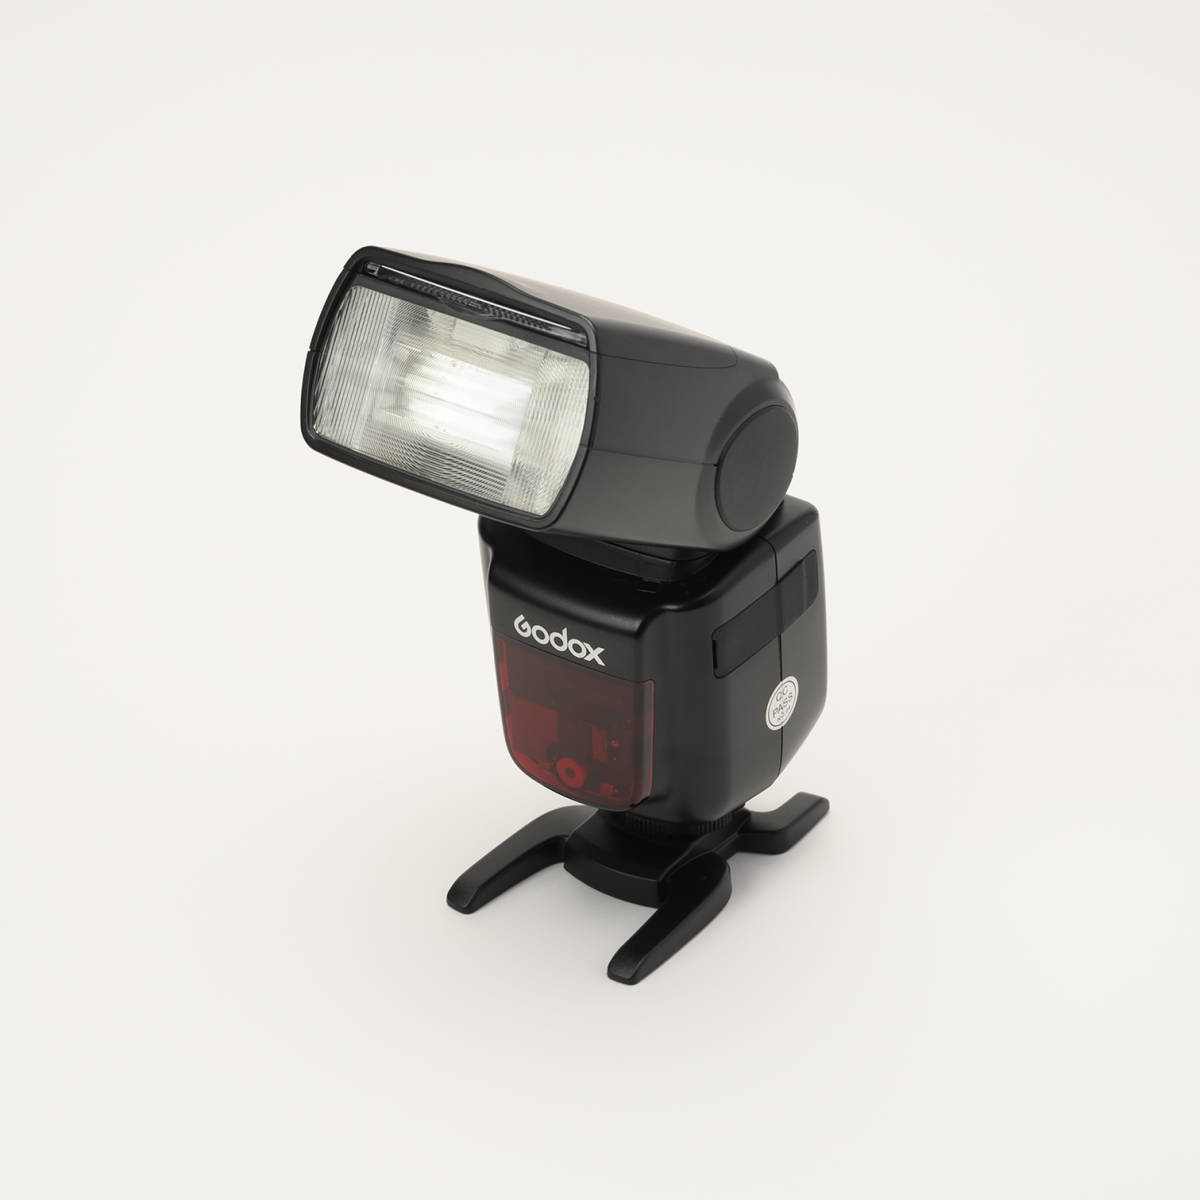 Godox V860IIF 富士カメラ用 カメラフラッシュ 2.4GHz ワイヤレスX1システム TTL GN60 充電式電池_画像4